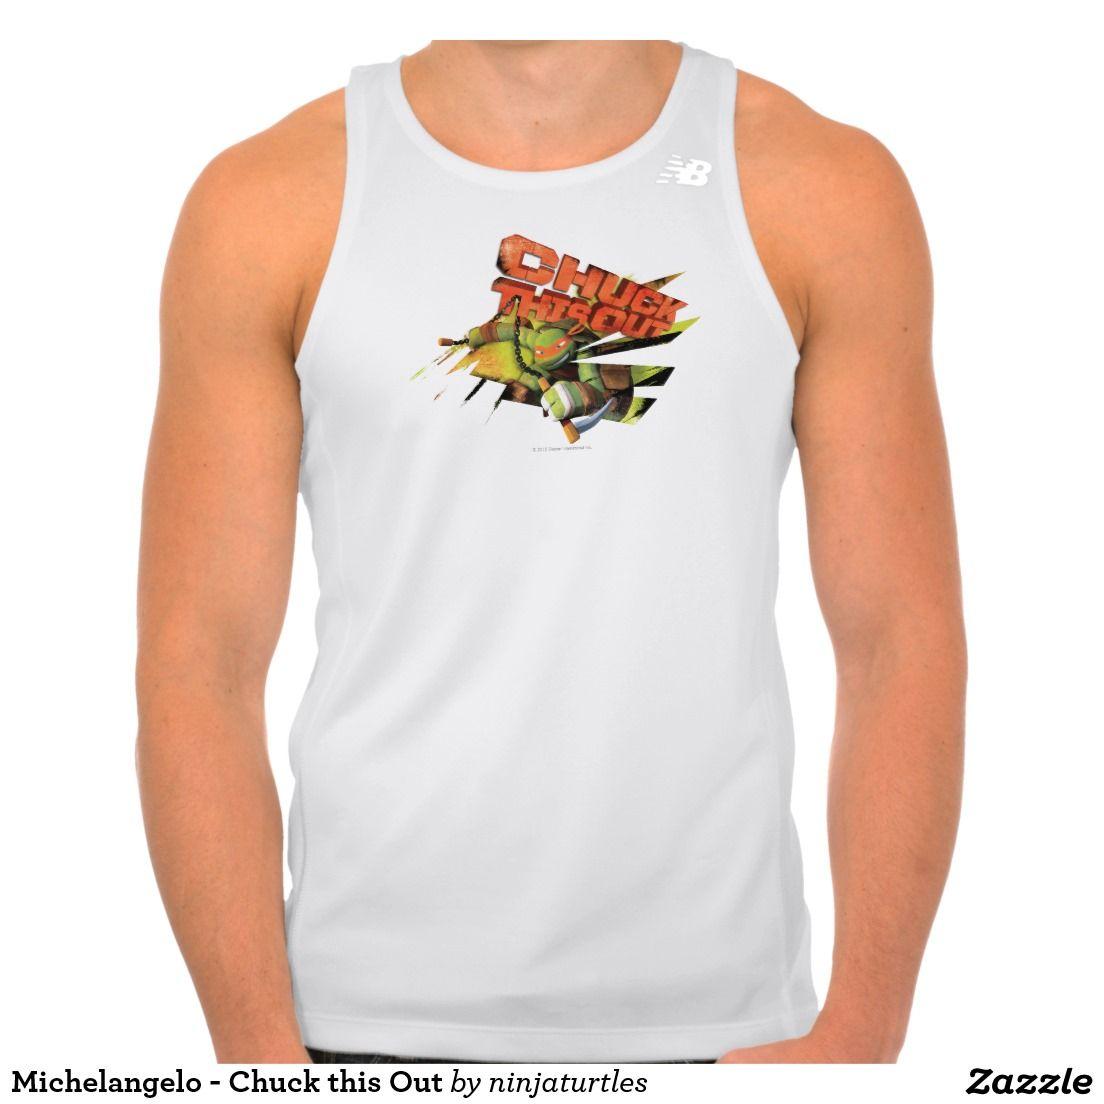 Michelangelo - Chuck this Out Tee Shirt. Producto disponible en tienda Zazzle. Vestuario, moda. Product available in Zazzle store. Fashion wardrobe. Regalos, Gifts. #camiseta #tshirt